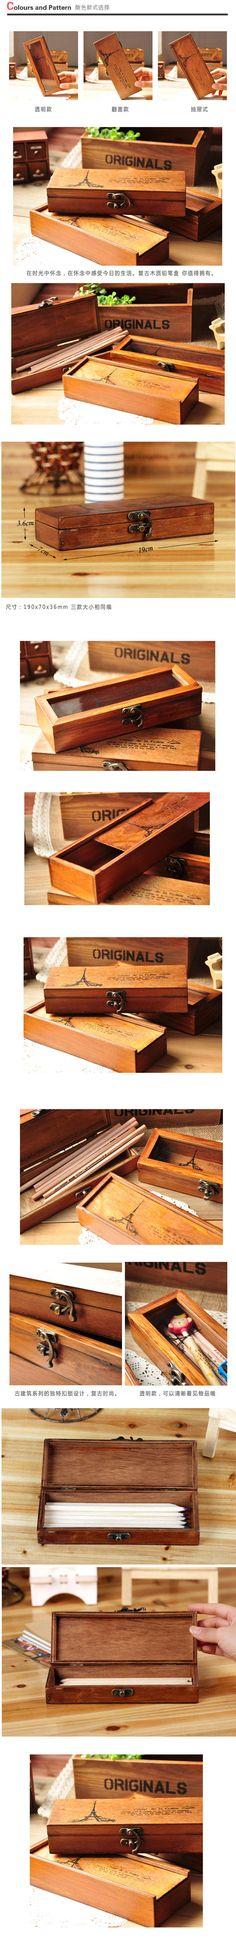 Eiffel Tower Print Wooden Pencil Case, ~$7